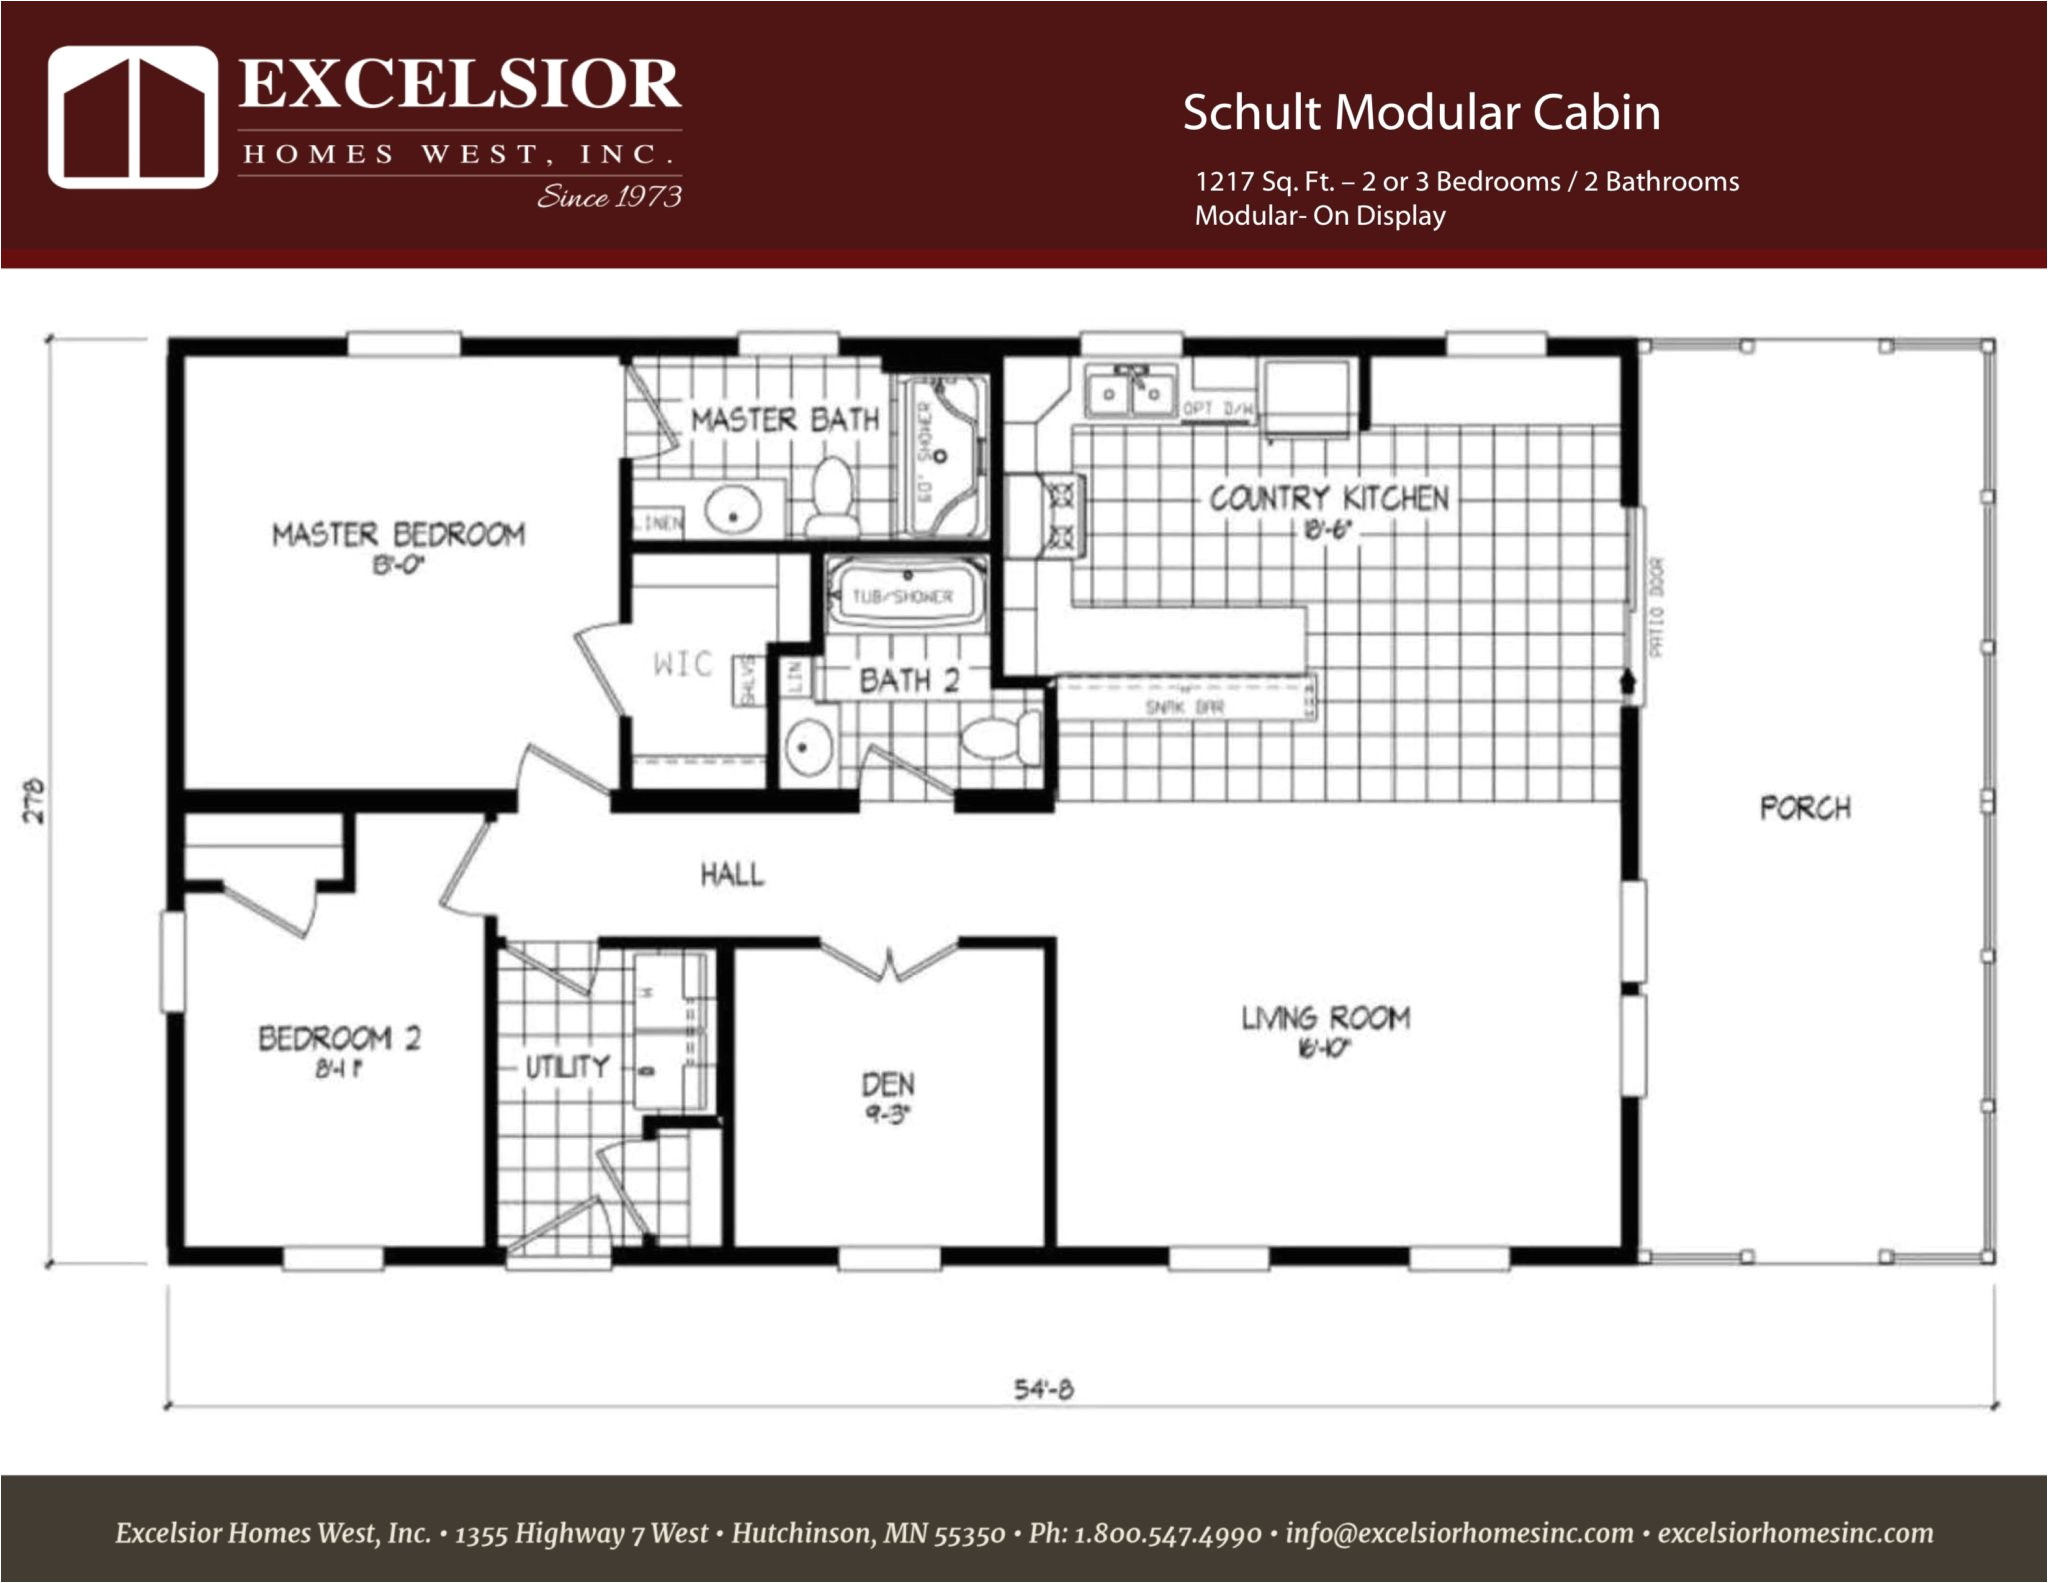 schult modular cabin model home